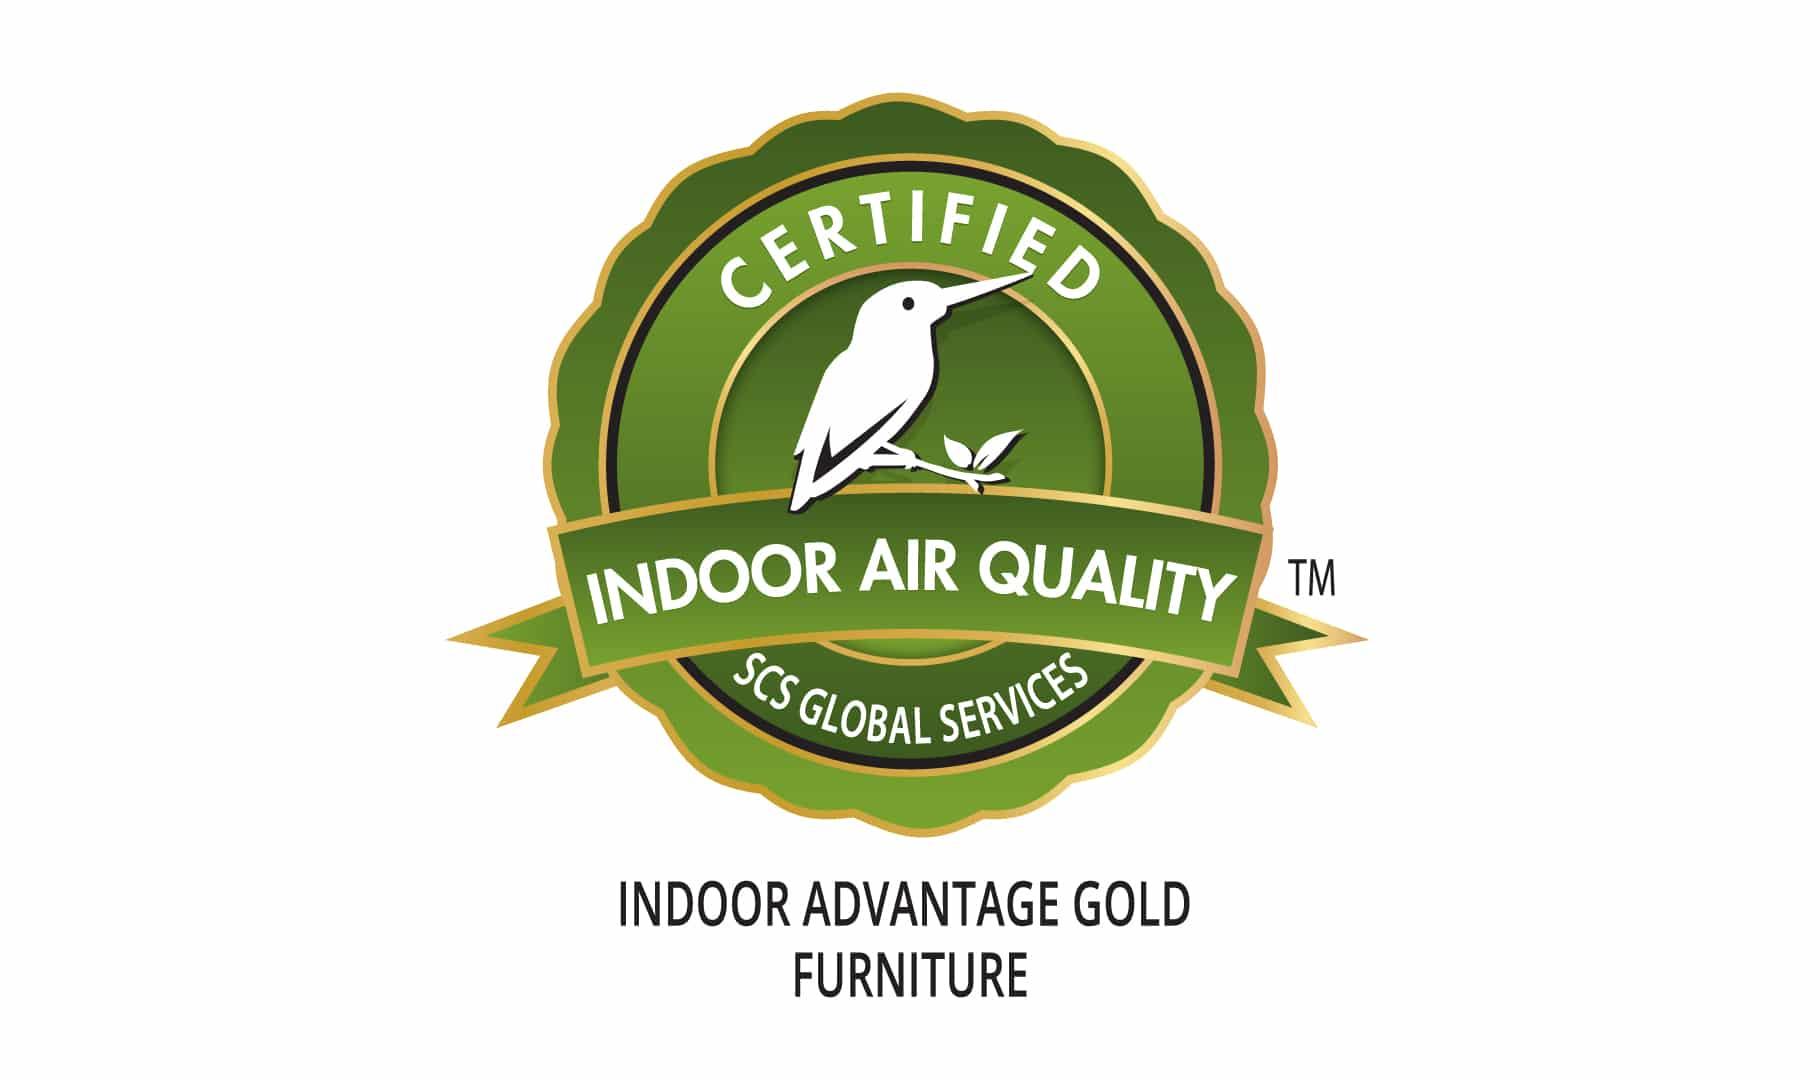 Indoor advantage gold furniture